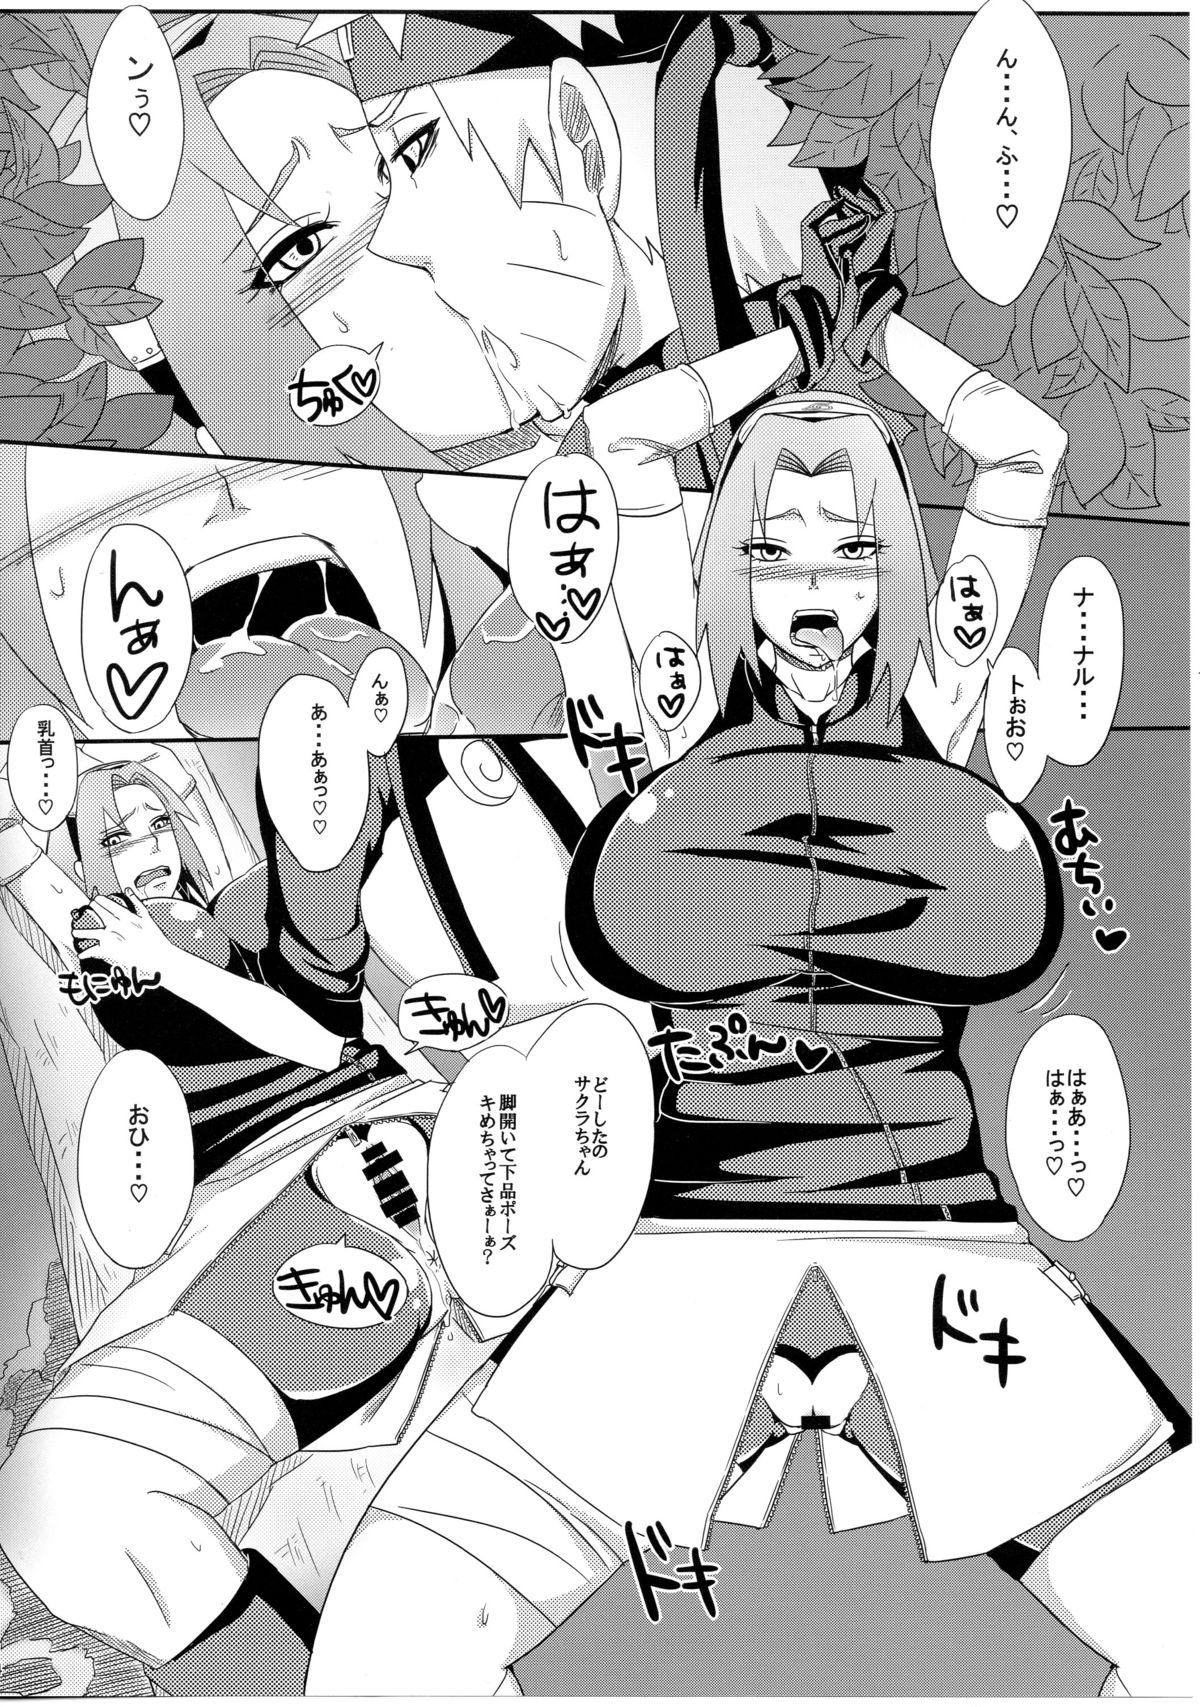 Konoha no Bitch-chan! 2